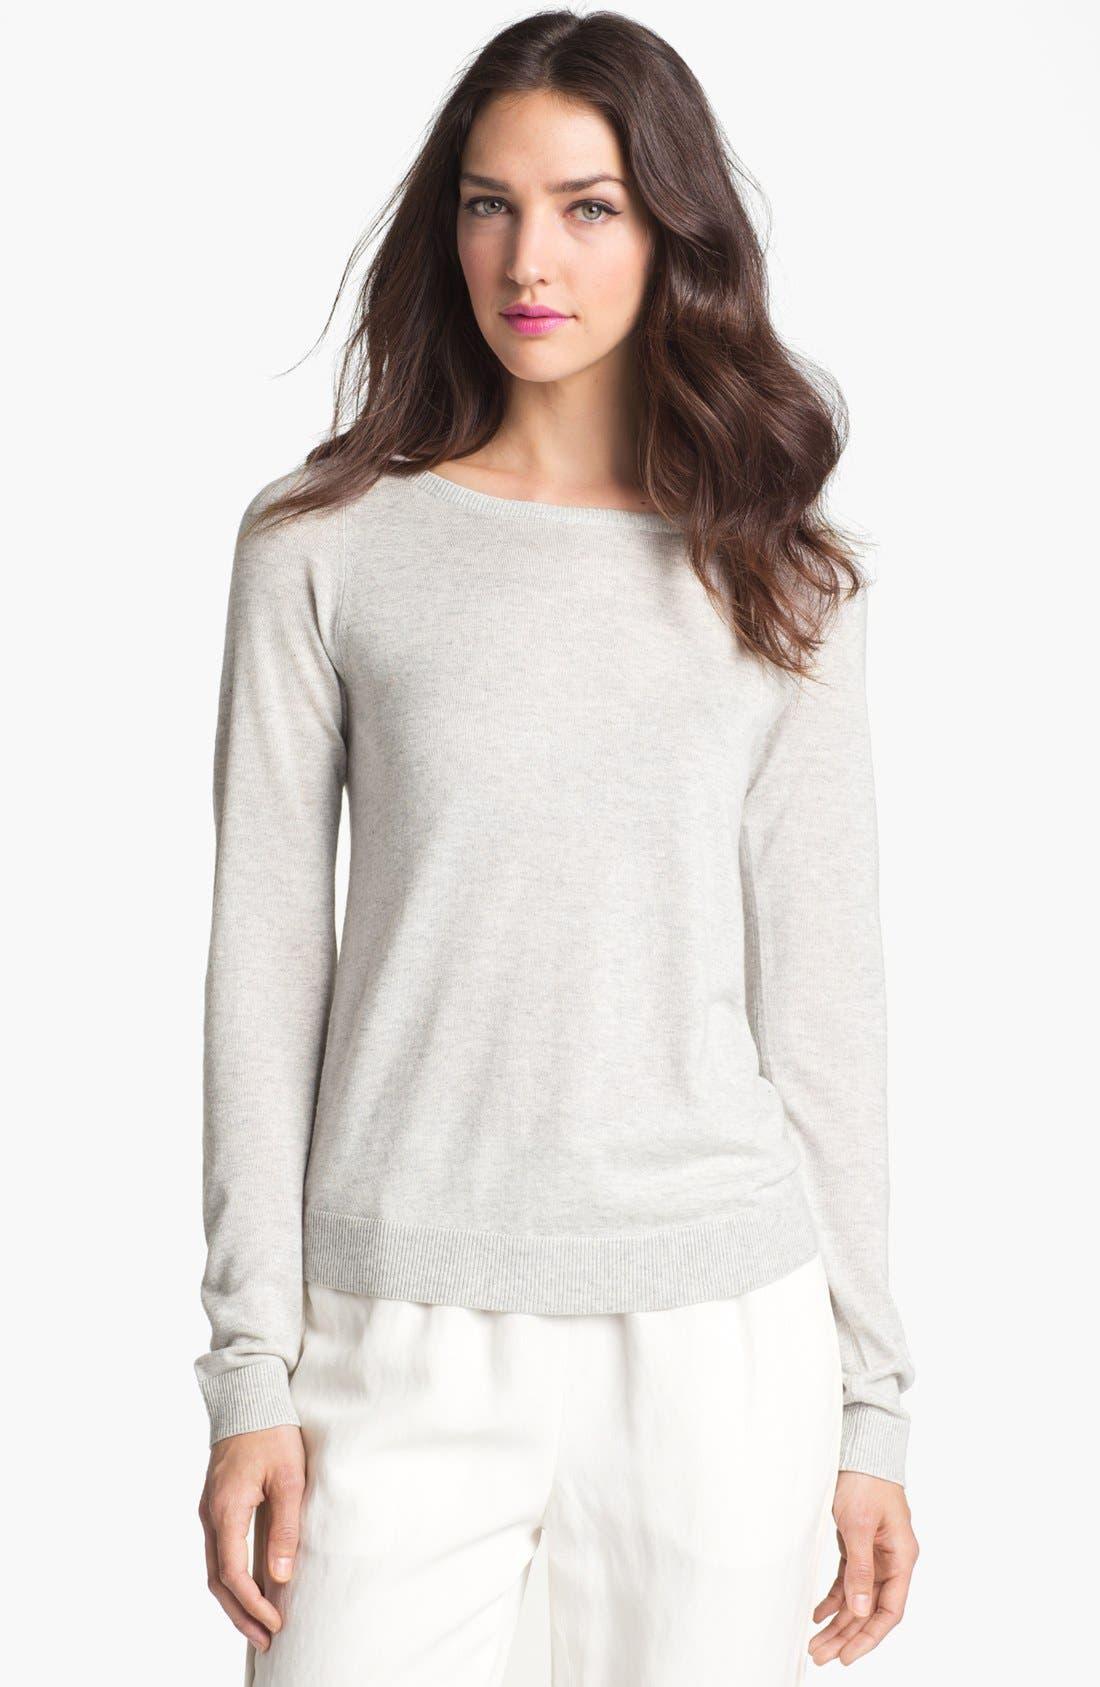 Alternate Image 1 Selected - Diane von Furstenberg 'New Noa' Silk & Cashmere Sweater